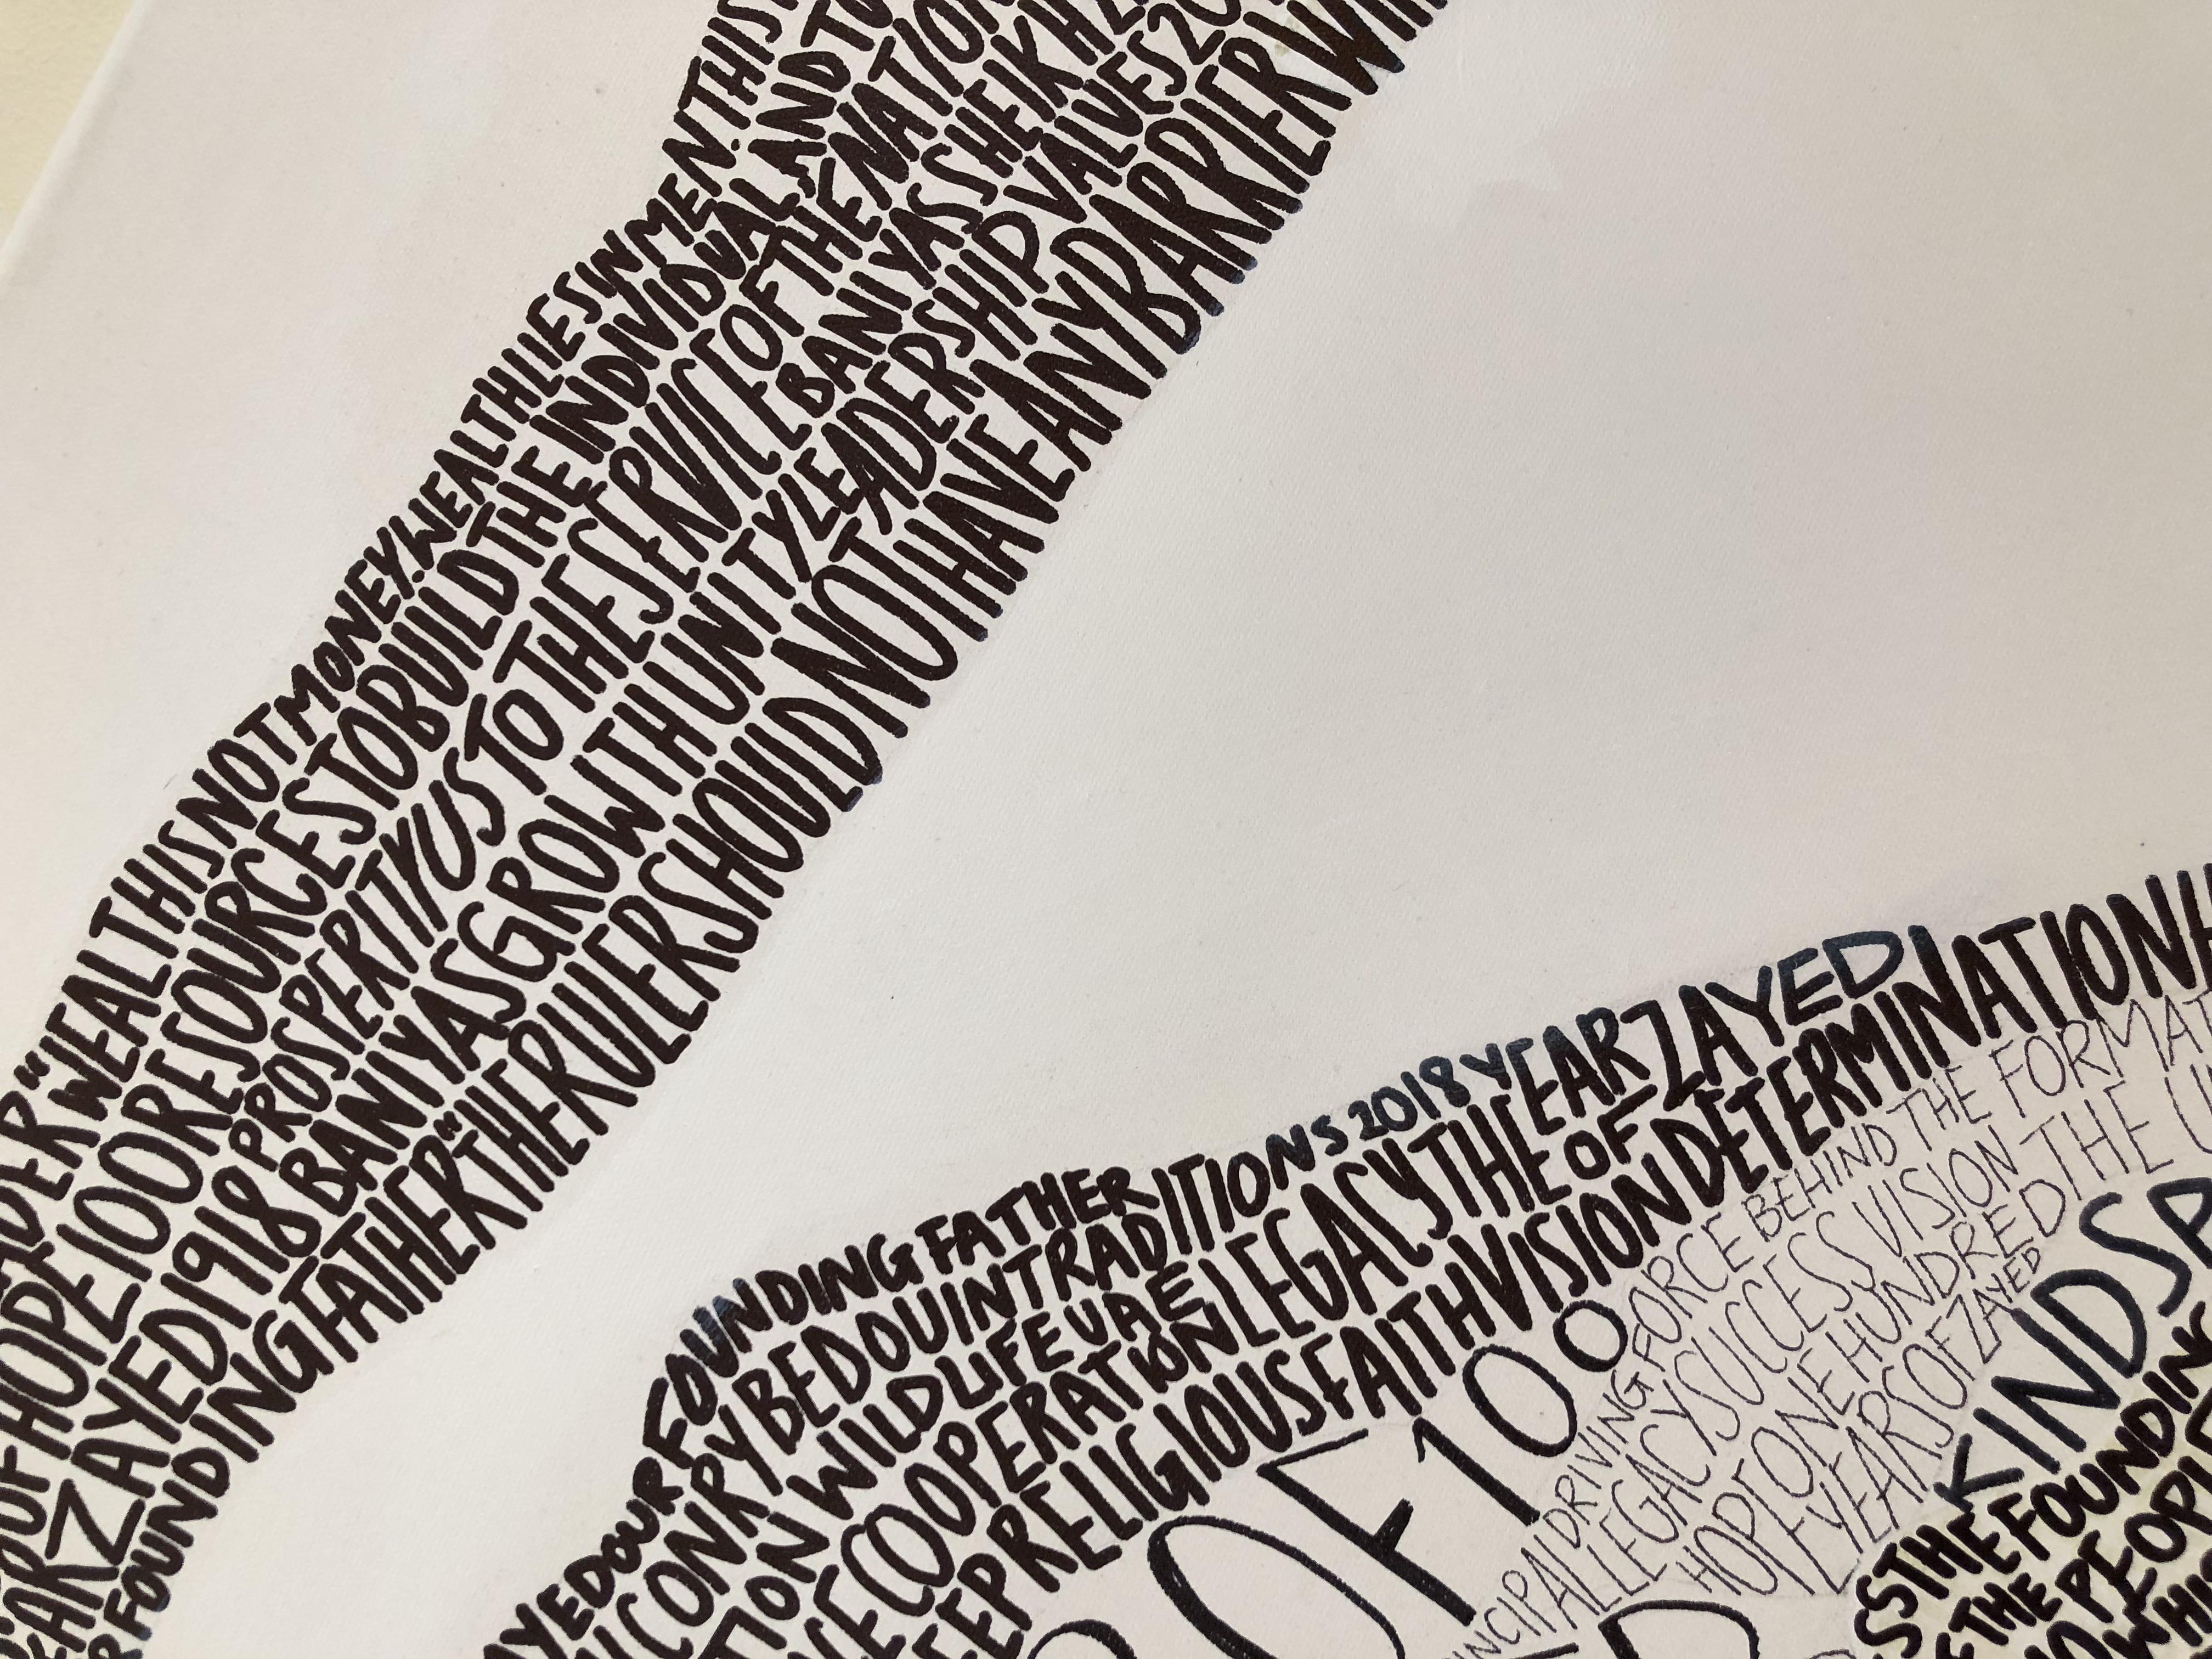 Story Of A Leader Natalie Daghestani Art Dubai Artist BSAB 5